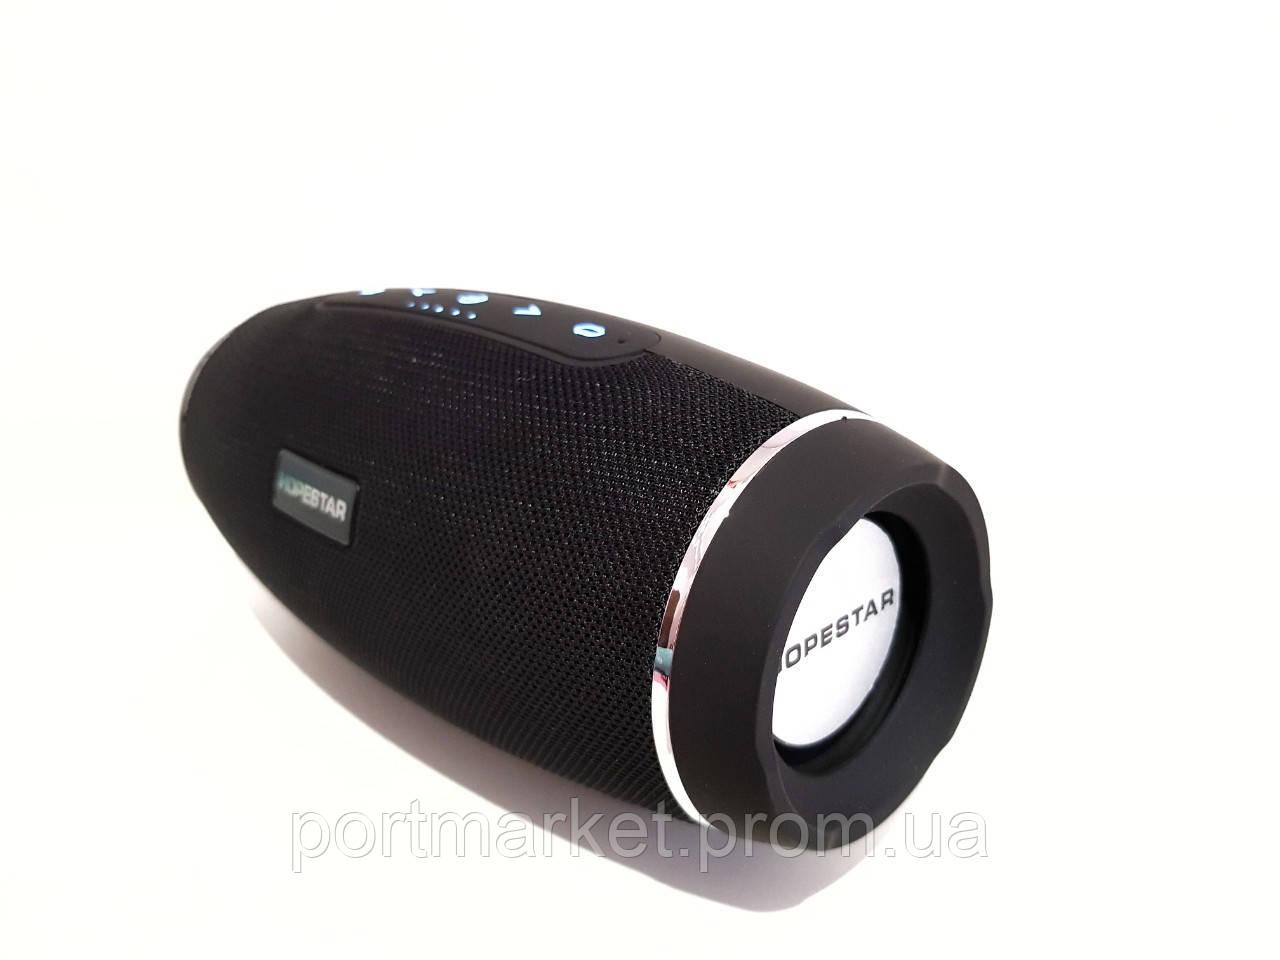 Портативная Bluetooth колонка Hopestar H27(, MP3, AUX)